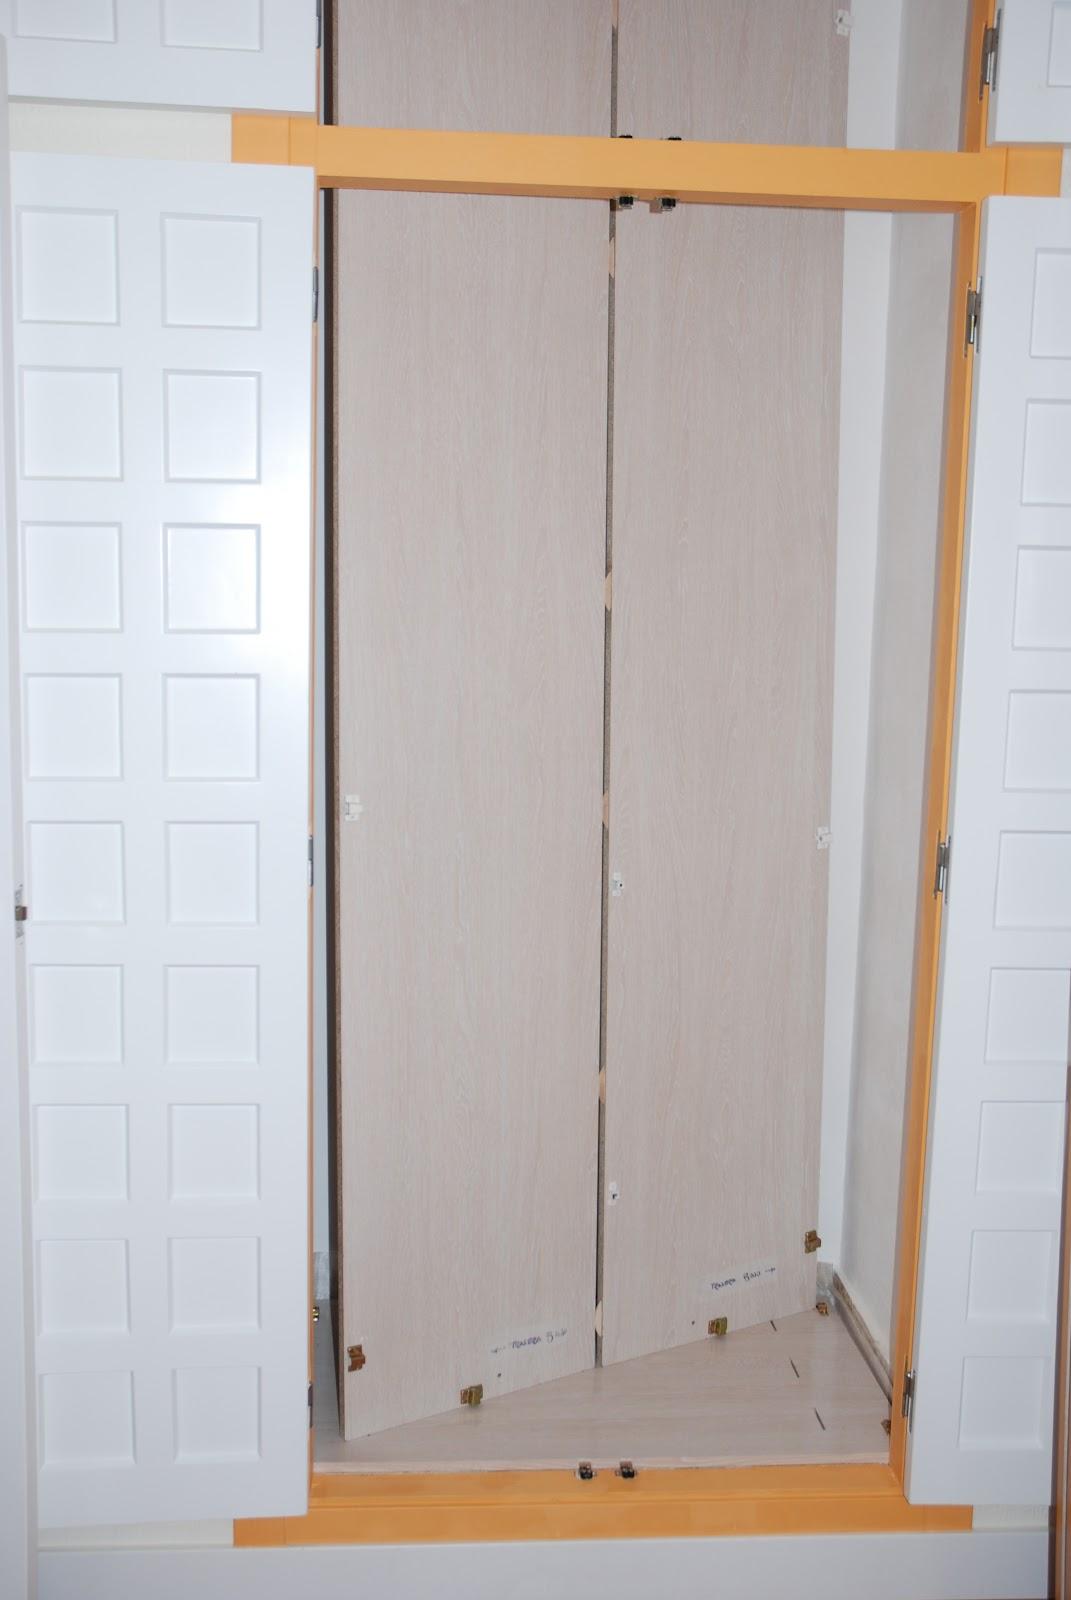 Montar armario empotrado interesting cmo hacer un armario for Papel para forrar armarios empotrados